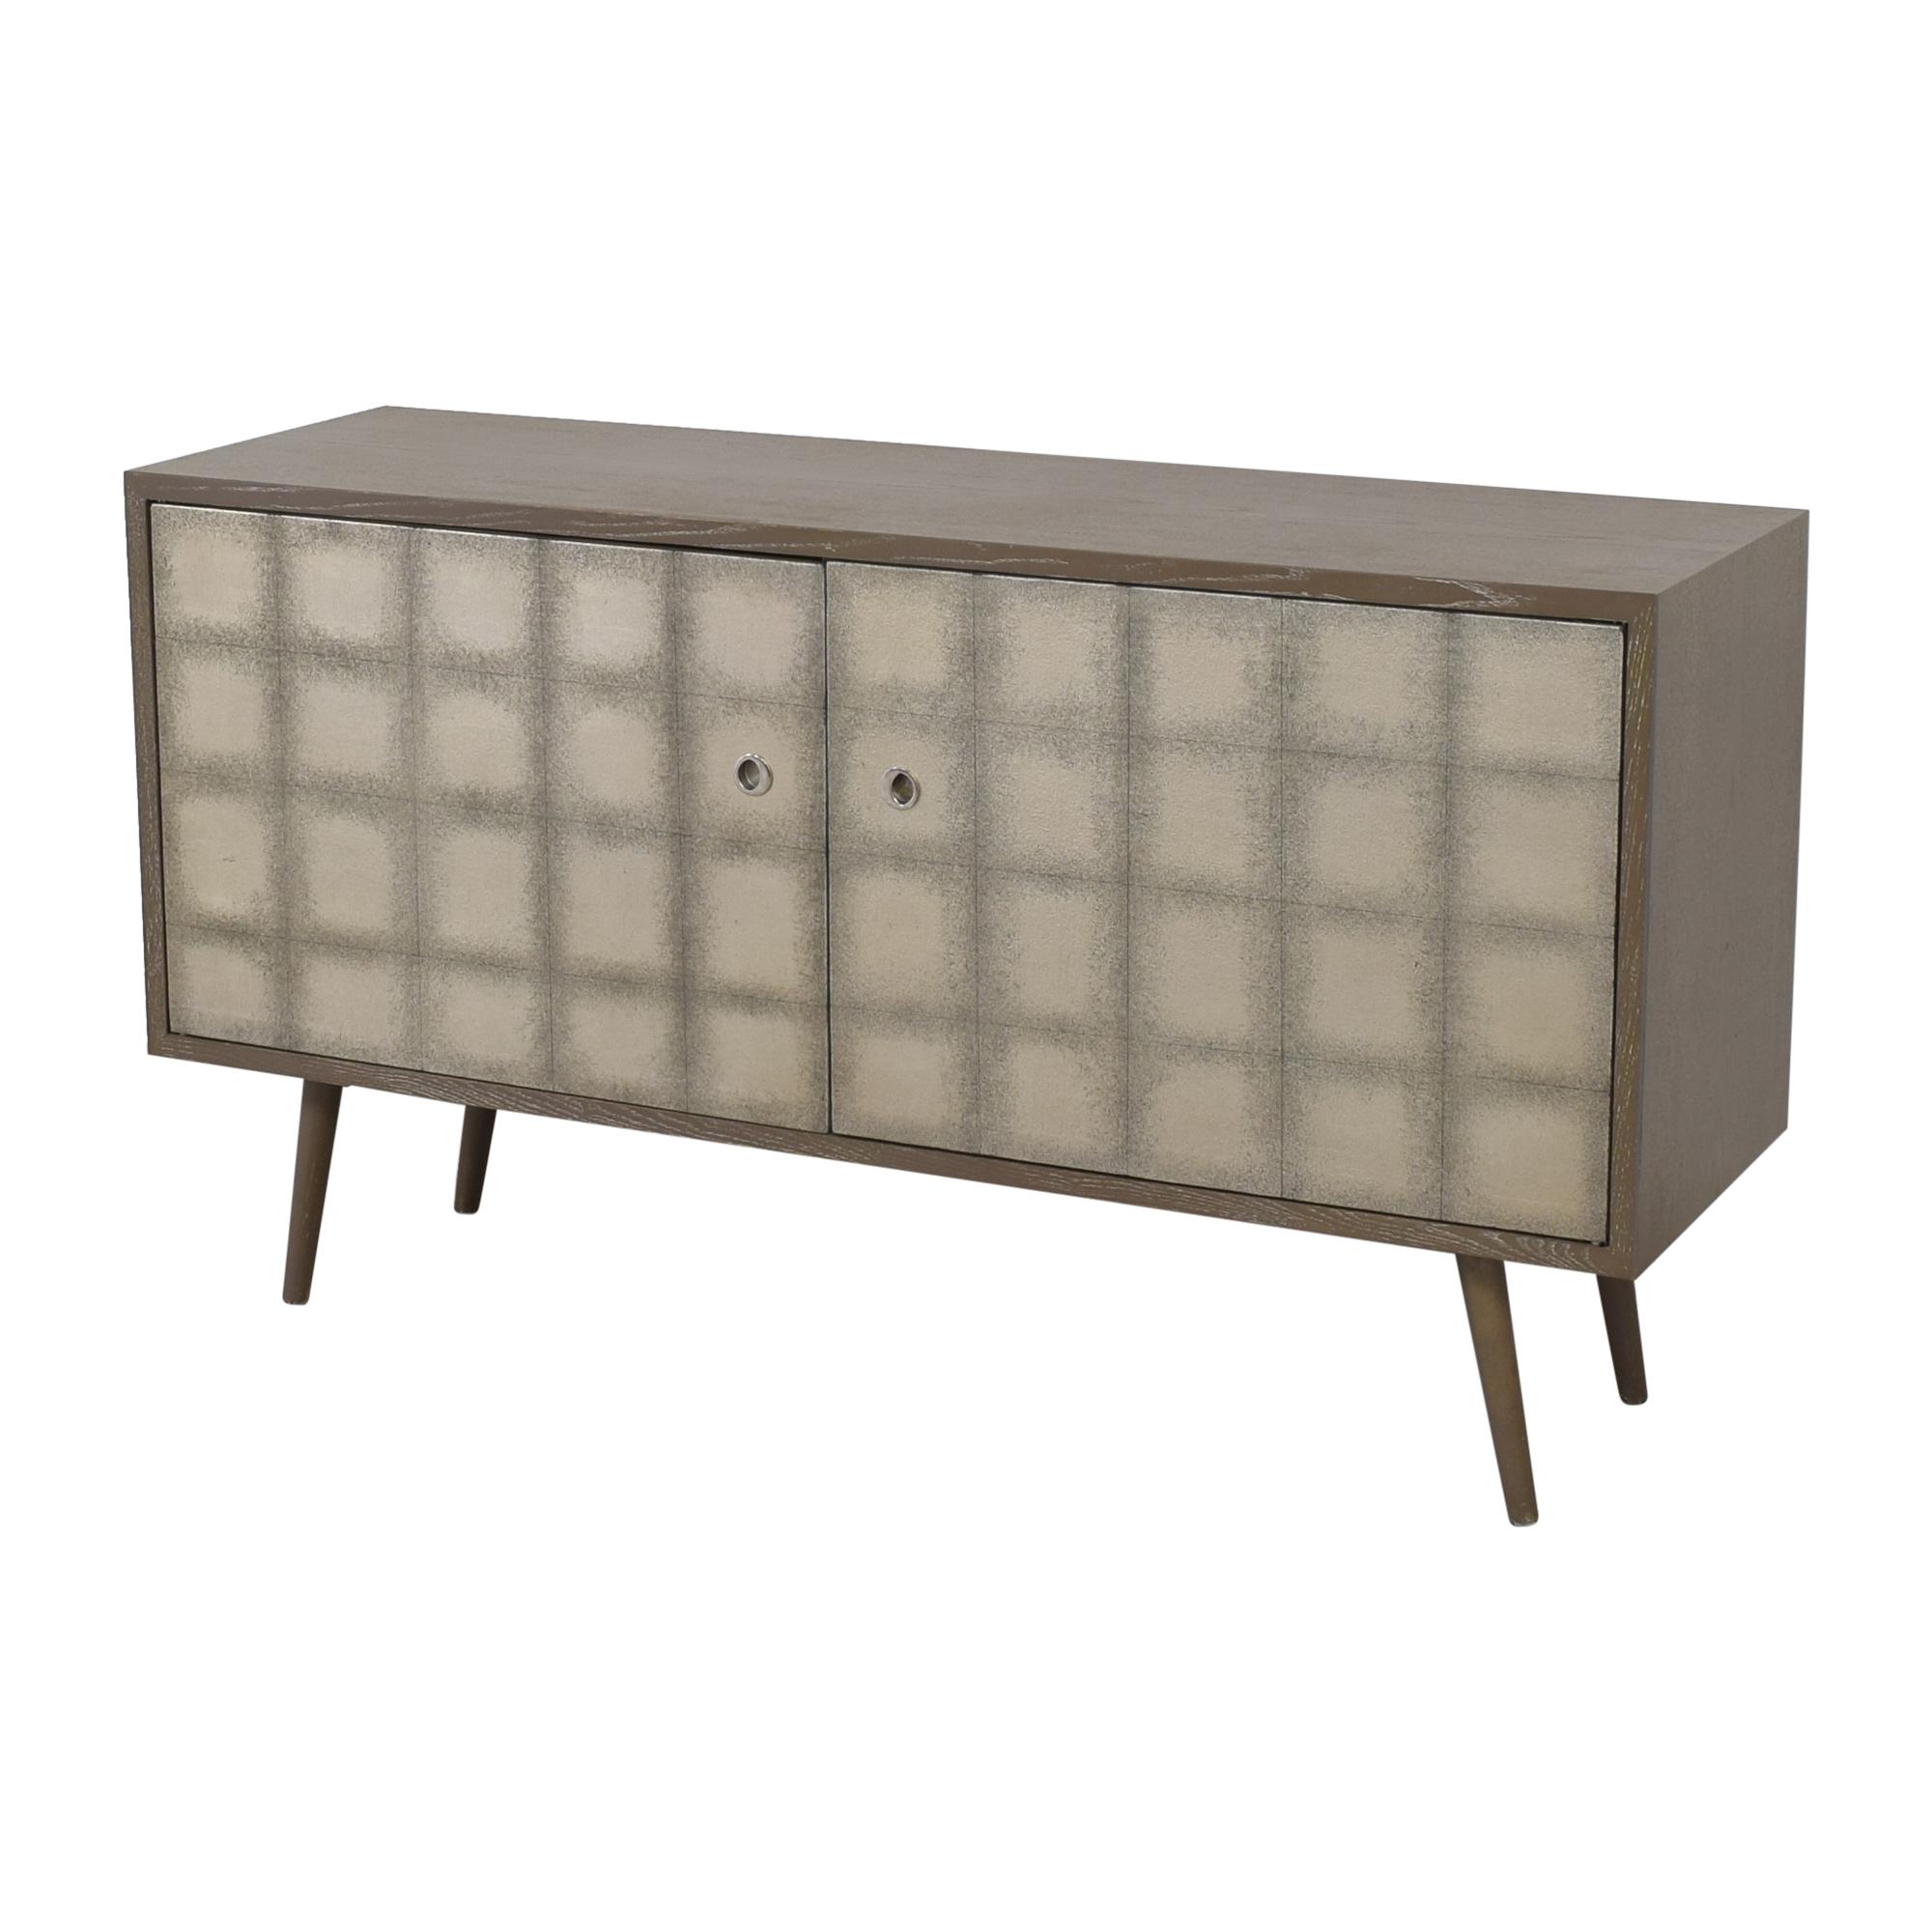 buy DwellStudio for Precedent Franklin Media Cabinet Precedent Furniture Cabinets & Sideboards